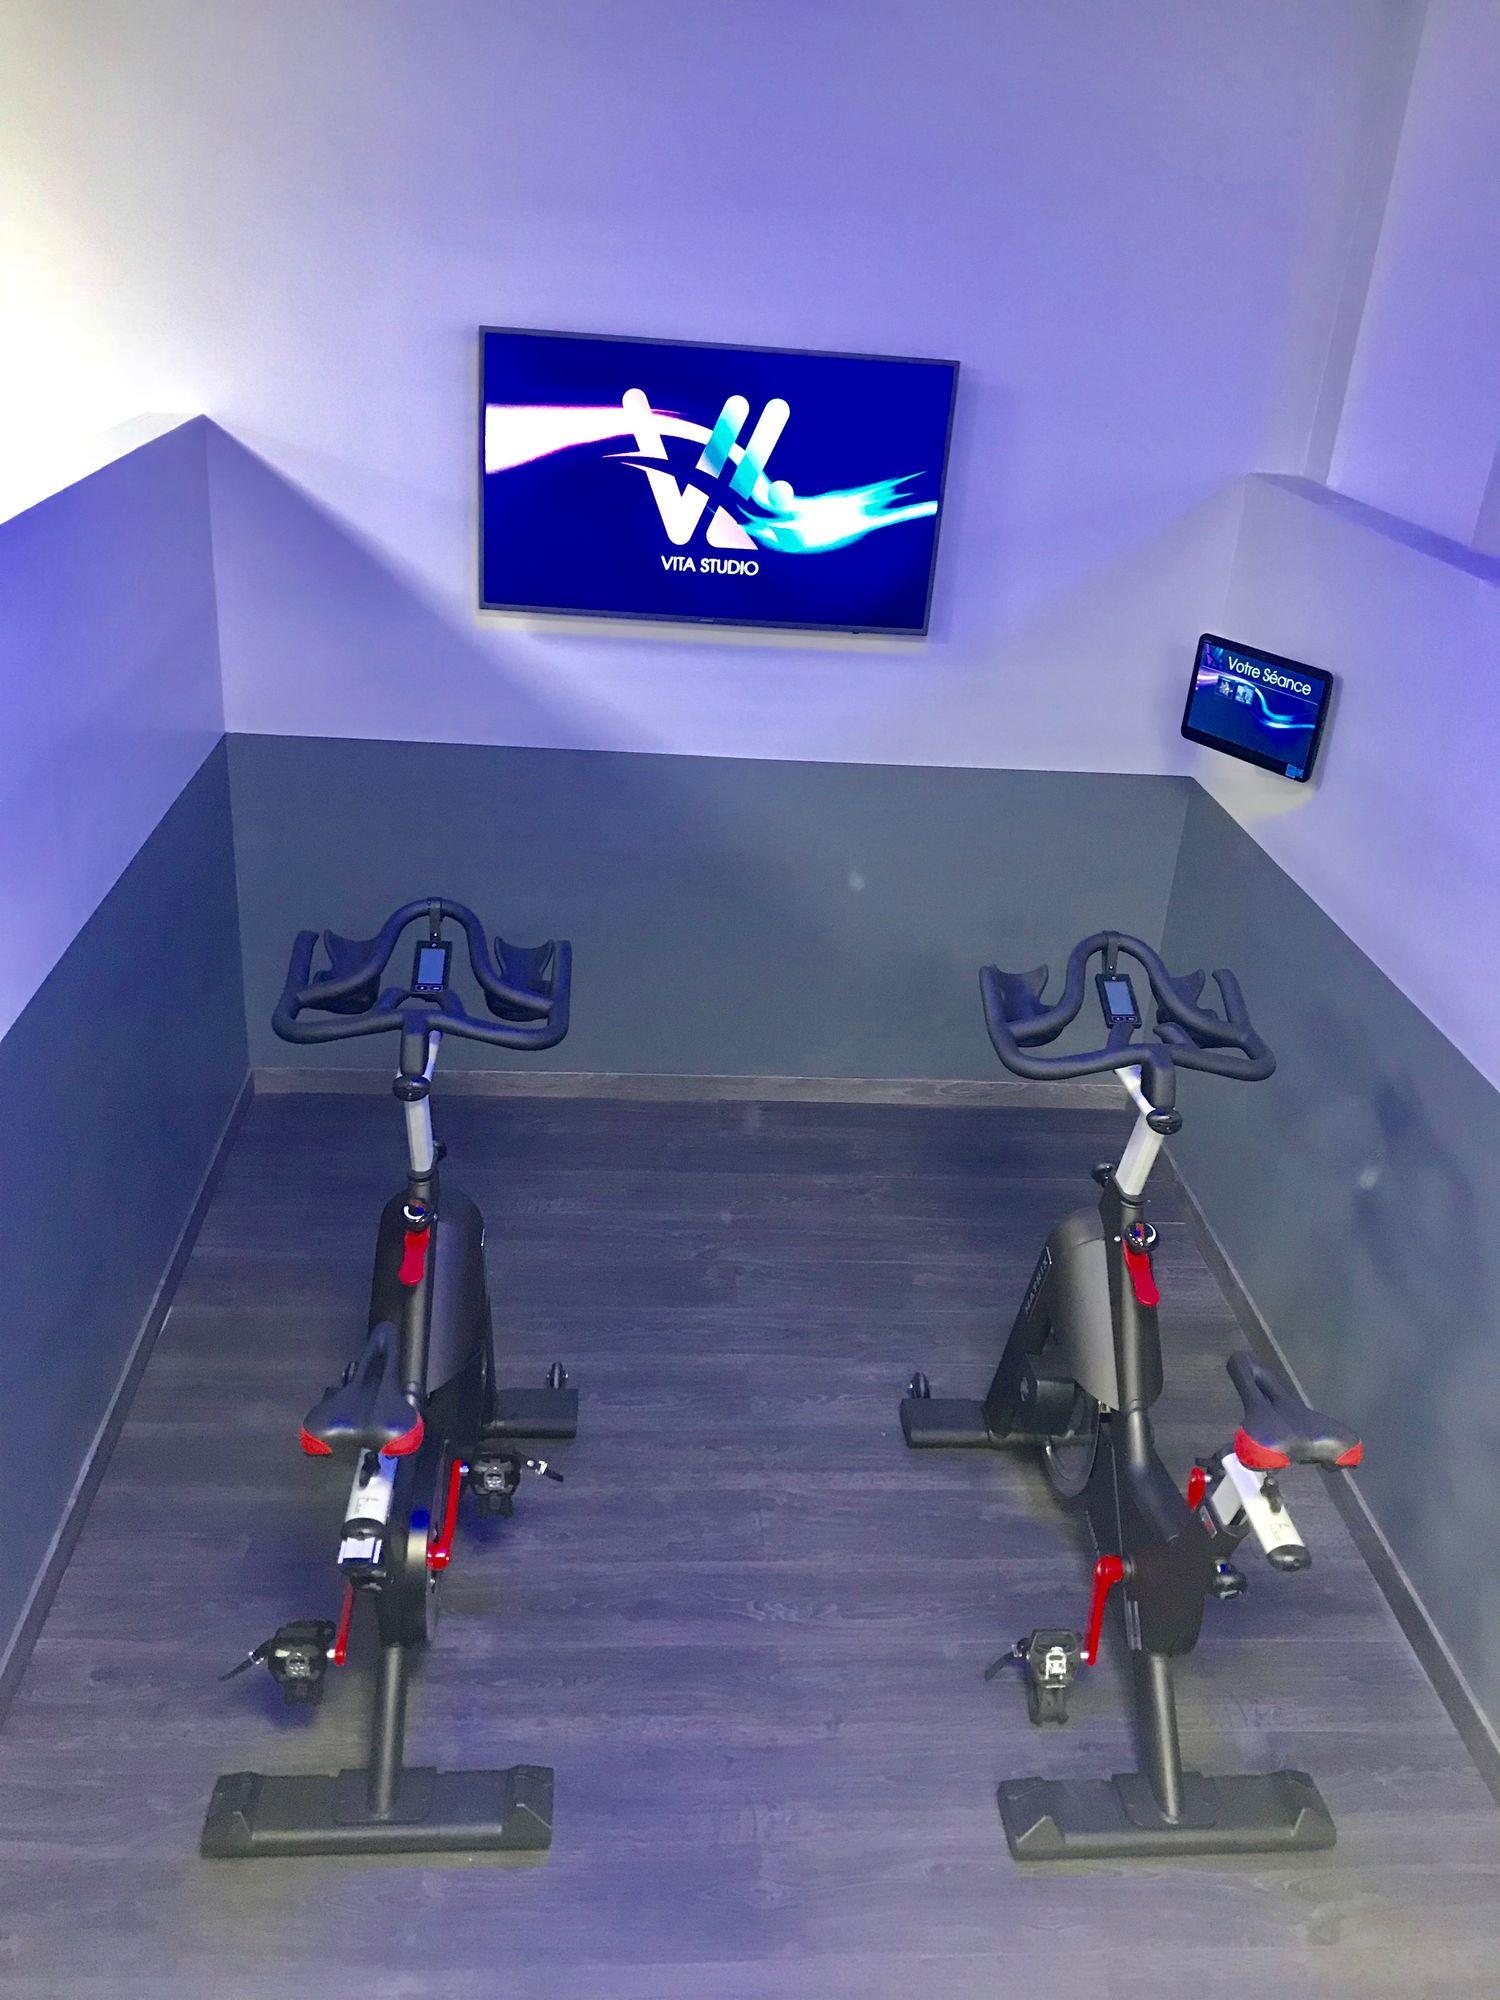 Salle de sport Vita liberté Martigues bike